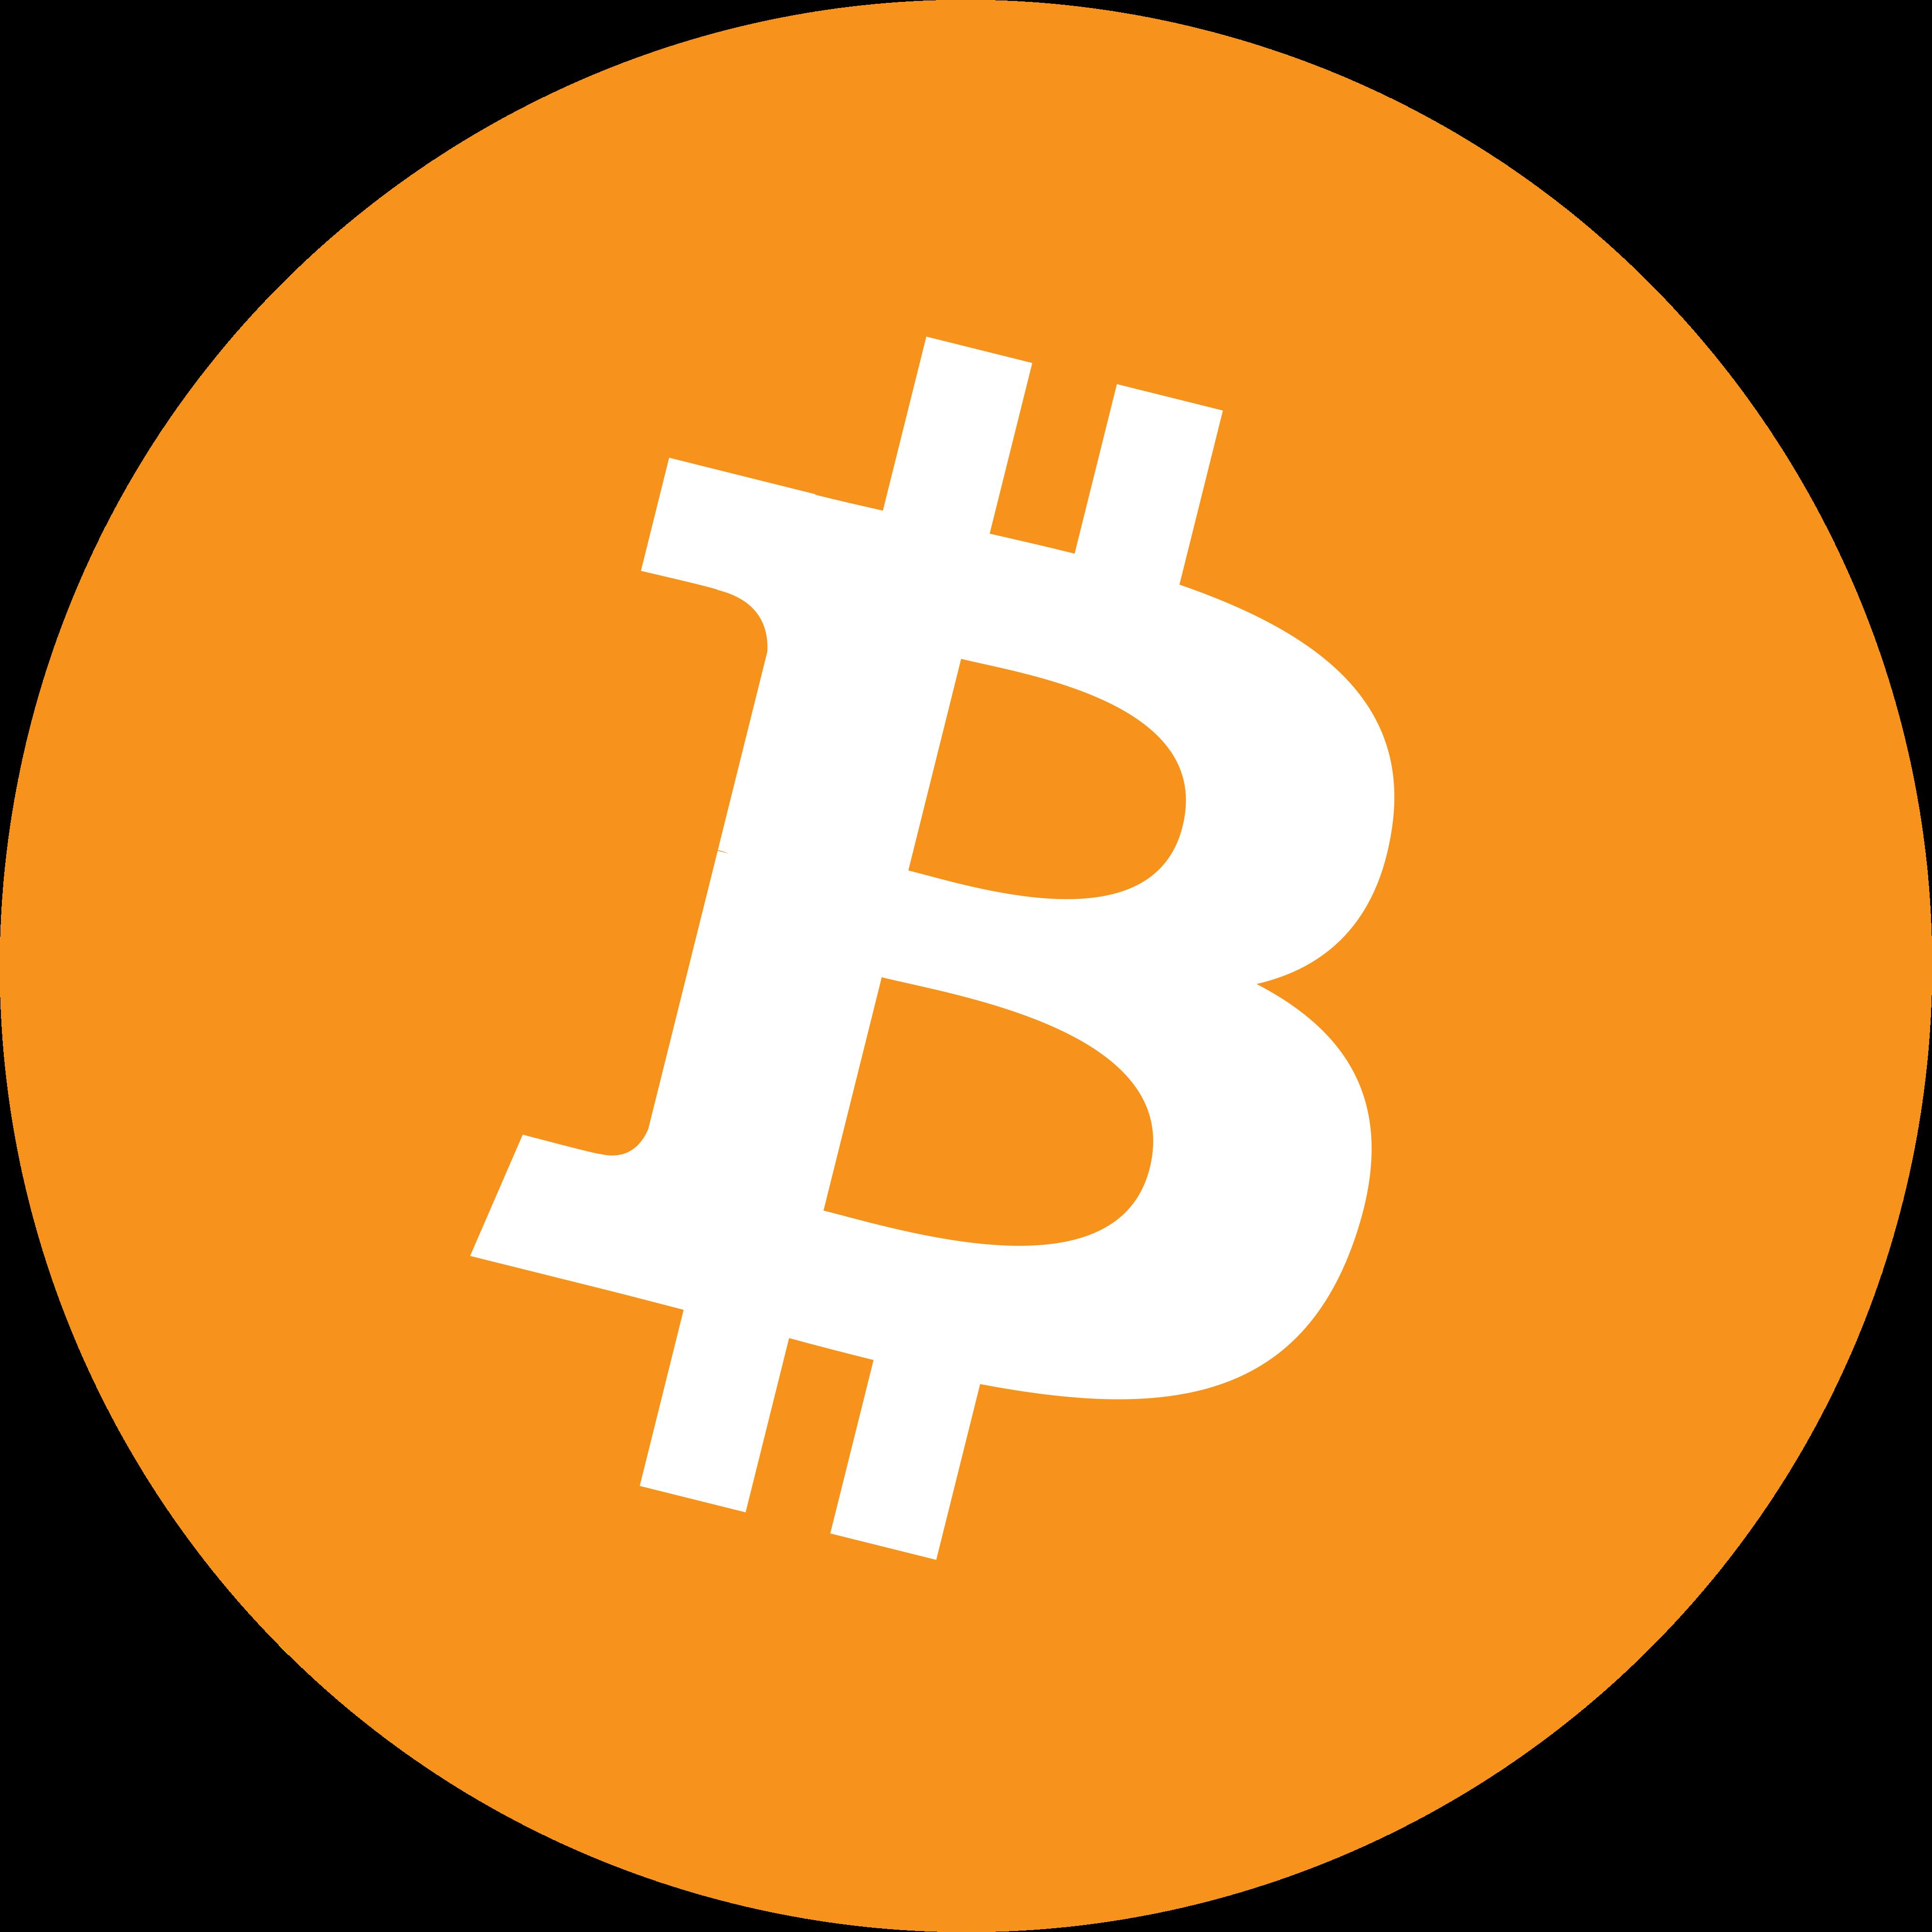 bitcoin logo 1 1 - Bitcoin Logo